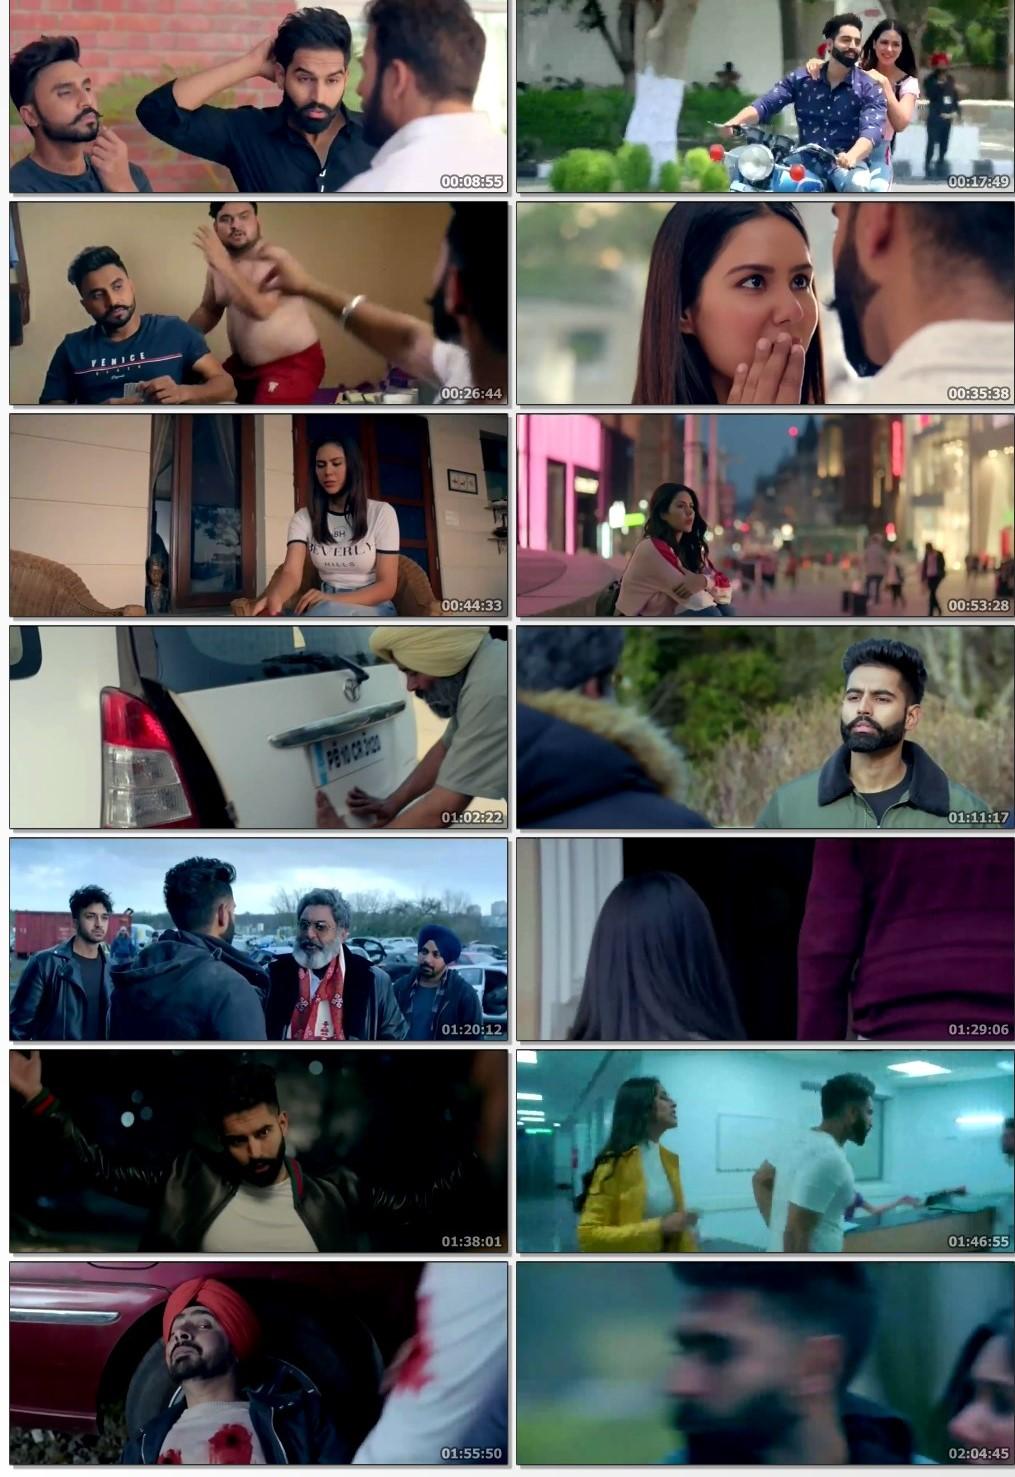 Jinde-Meriye-2020-Punjabi-Movie-720p-HDTV-900-MB-mkv-thumbs46e5fe7485651cad